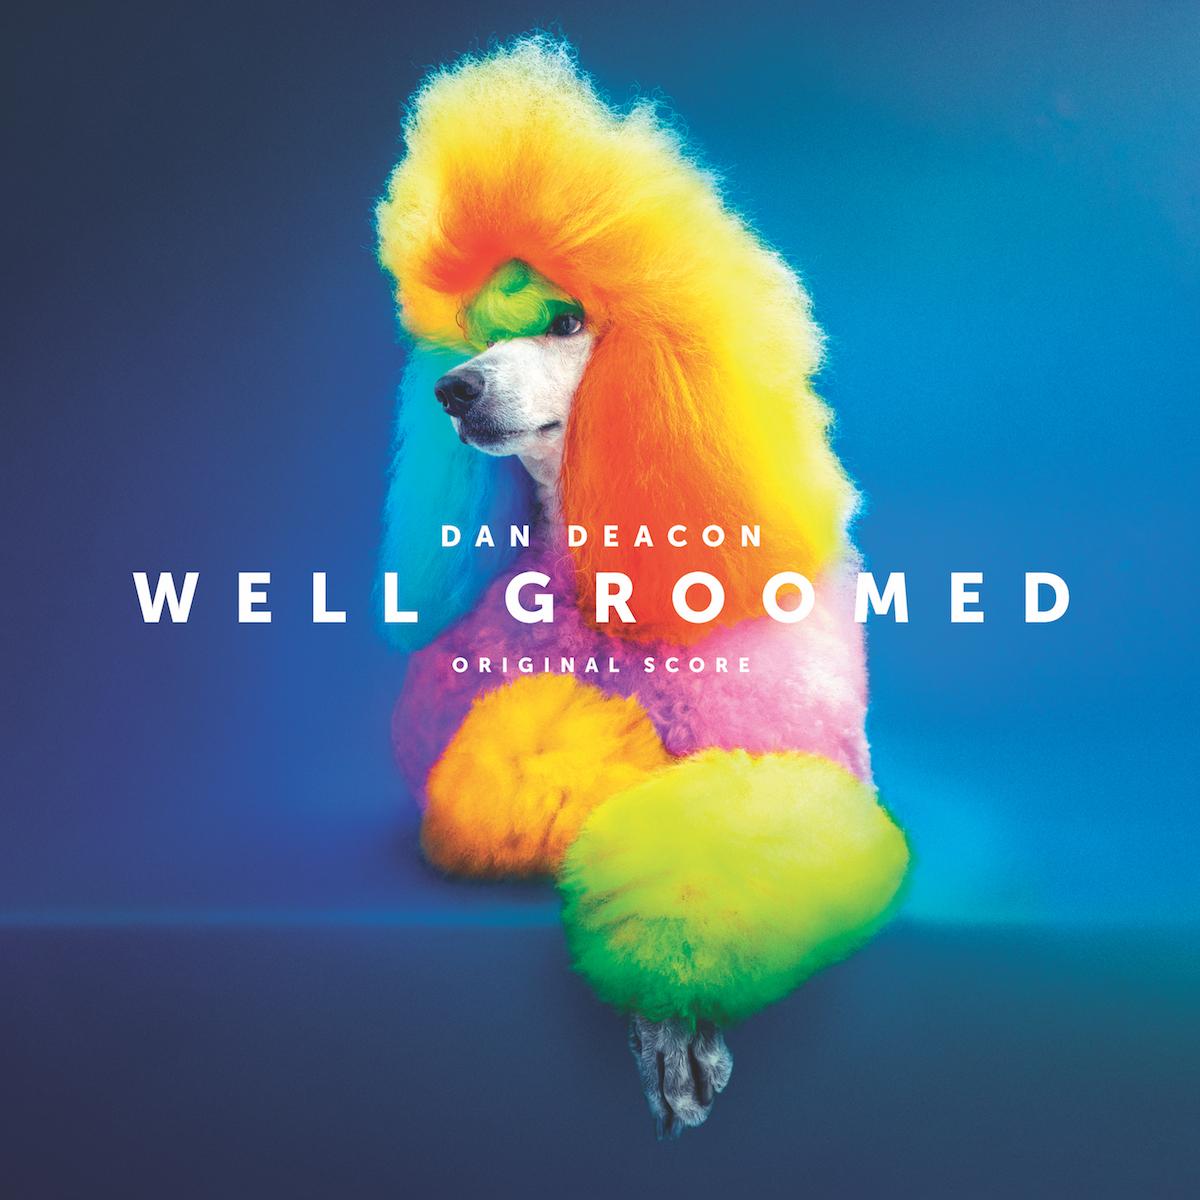 dan deacon well groomed score cover art